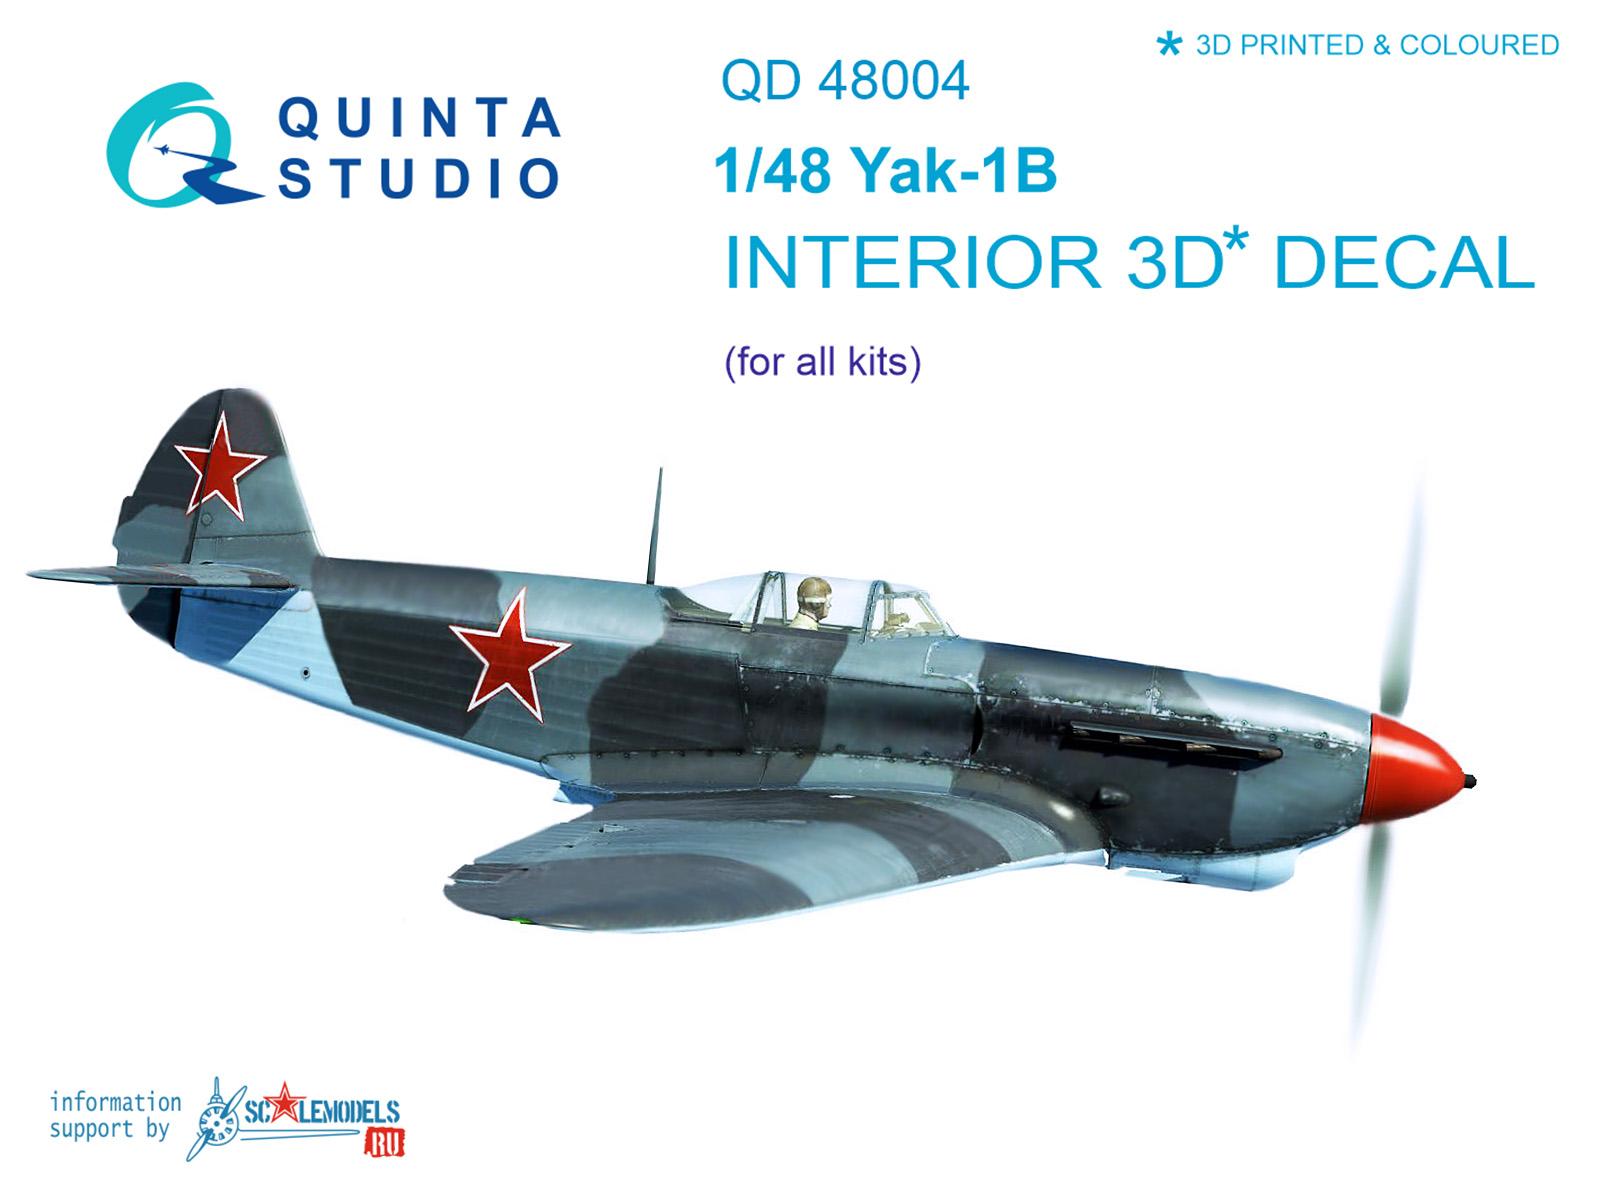 QD48004